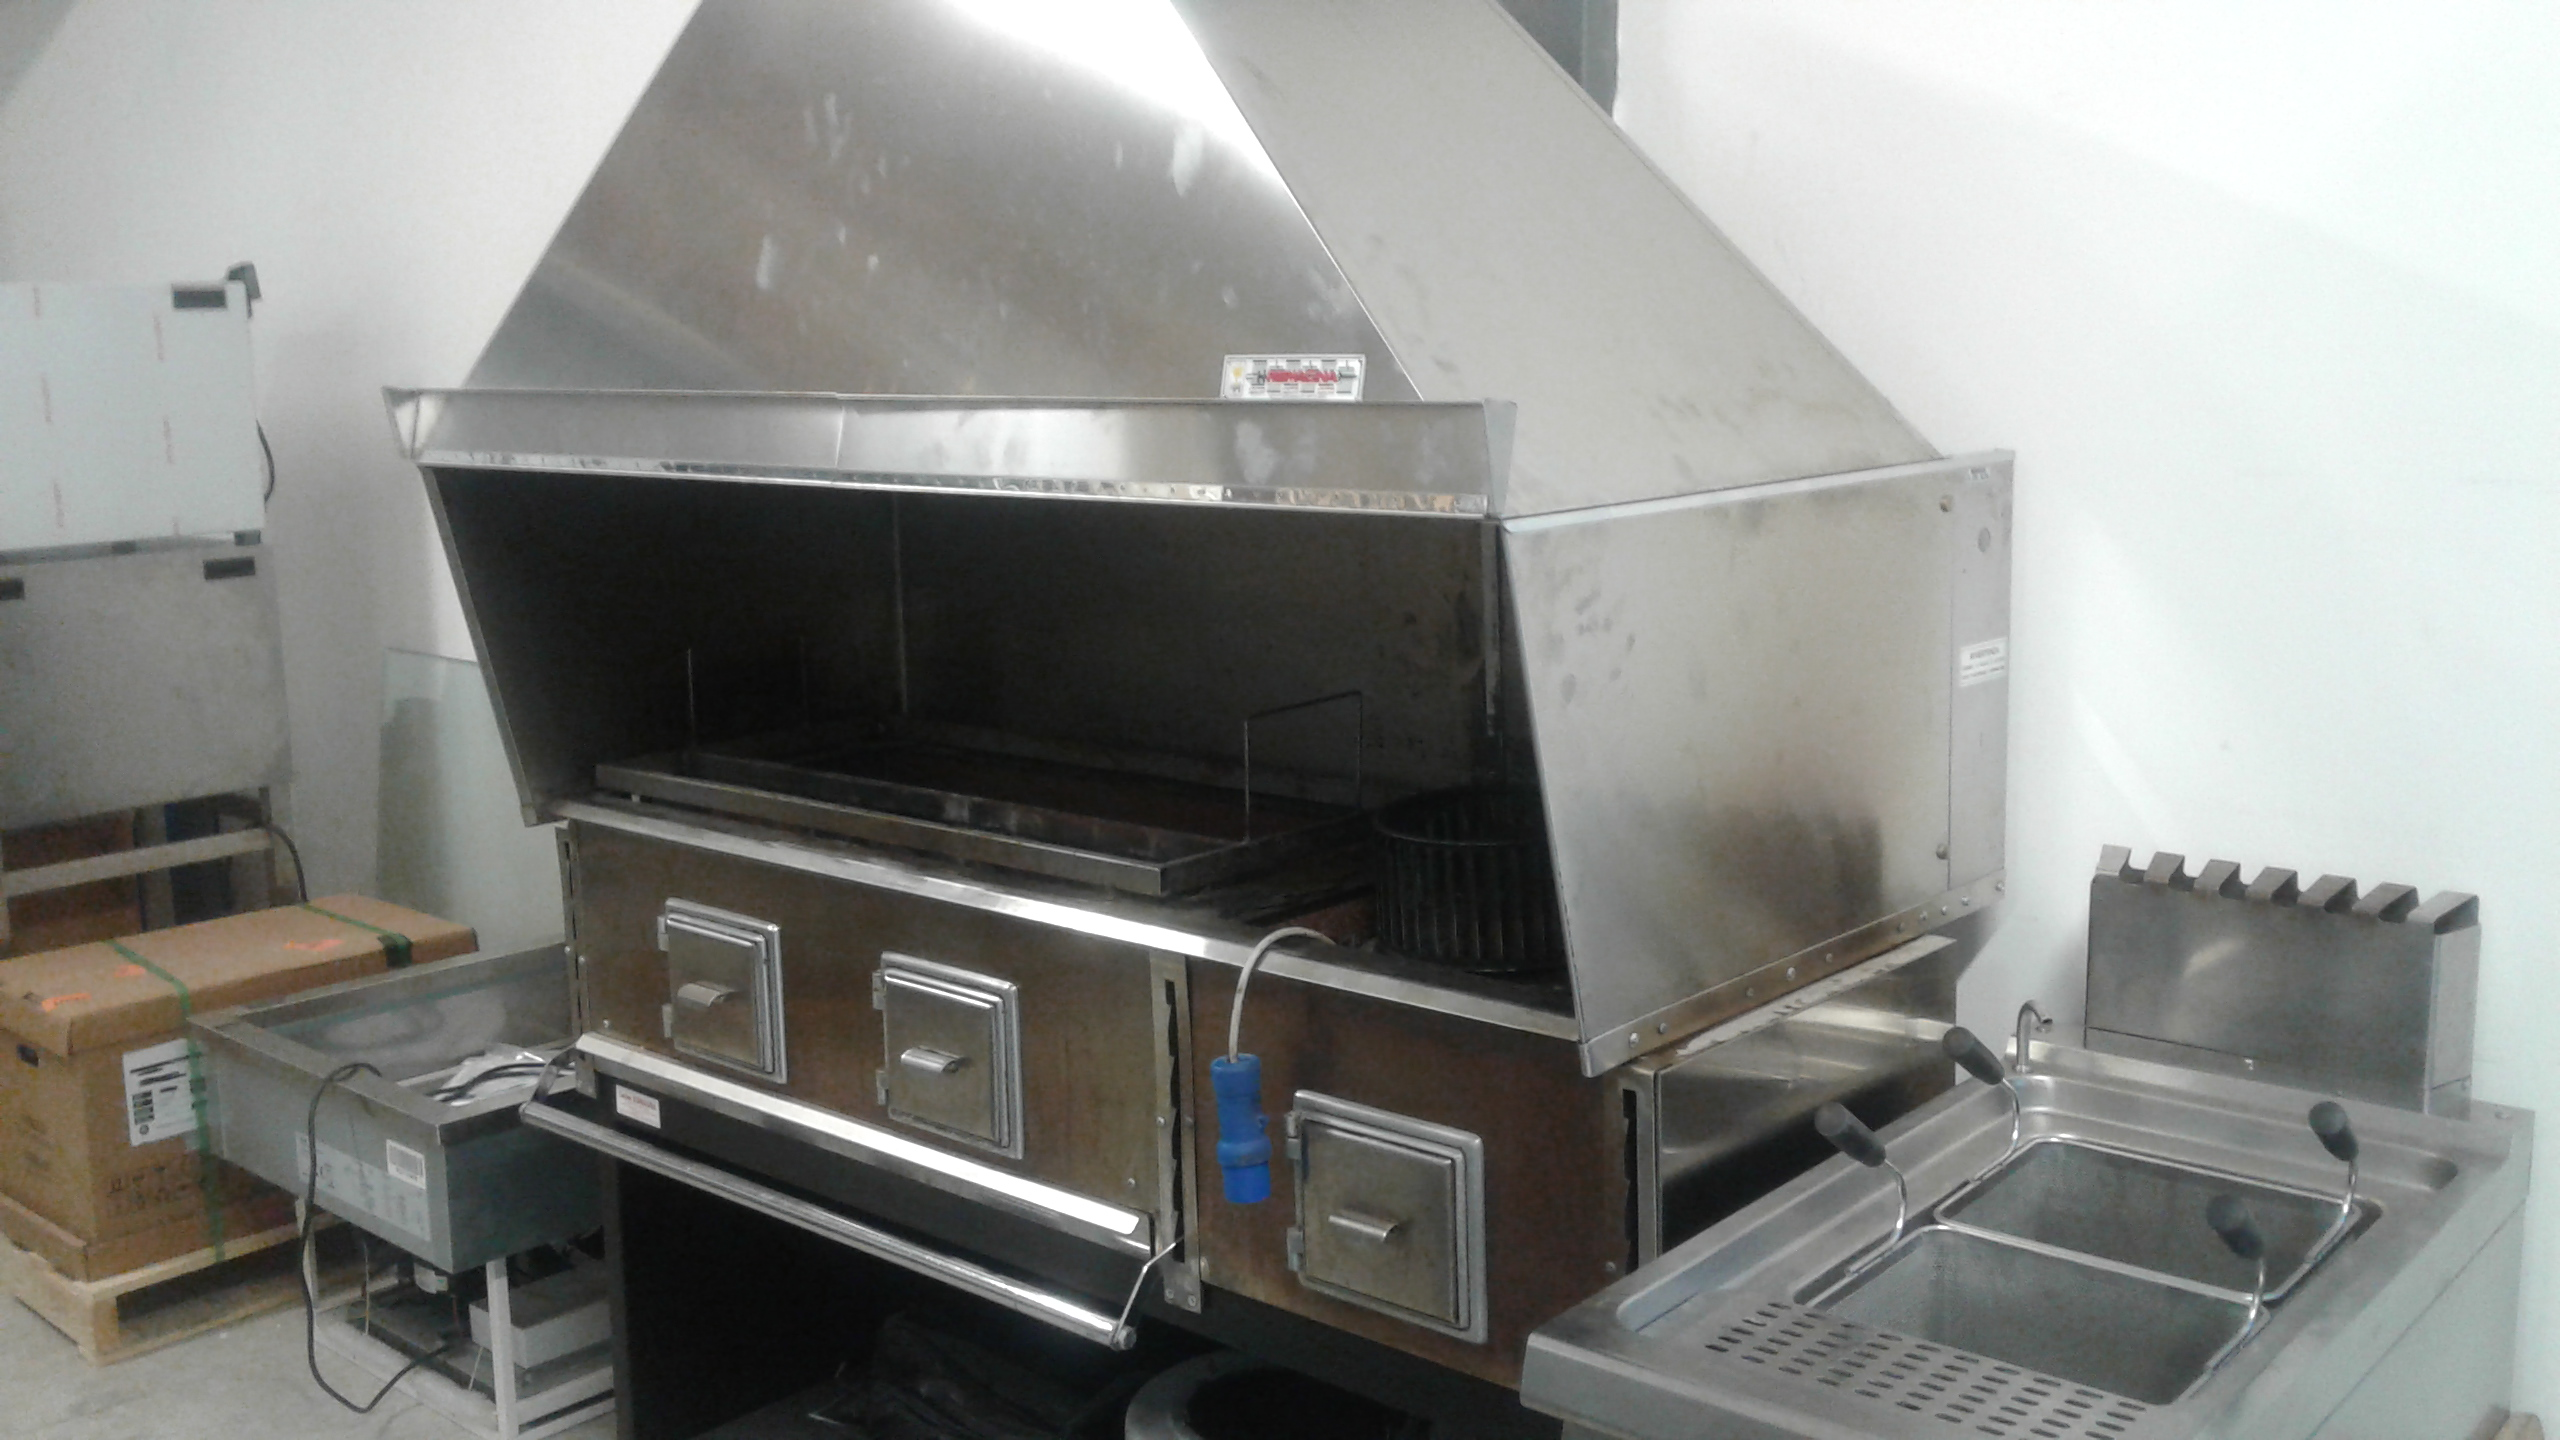 Cucina a carbone vegetale officina romagna modello 3 - Cappa cucina usata ...